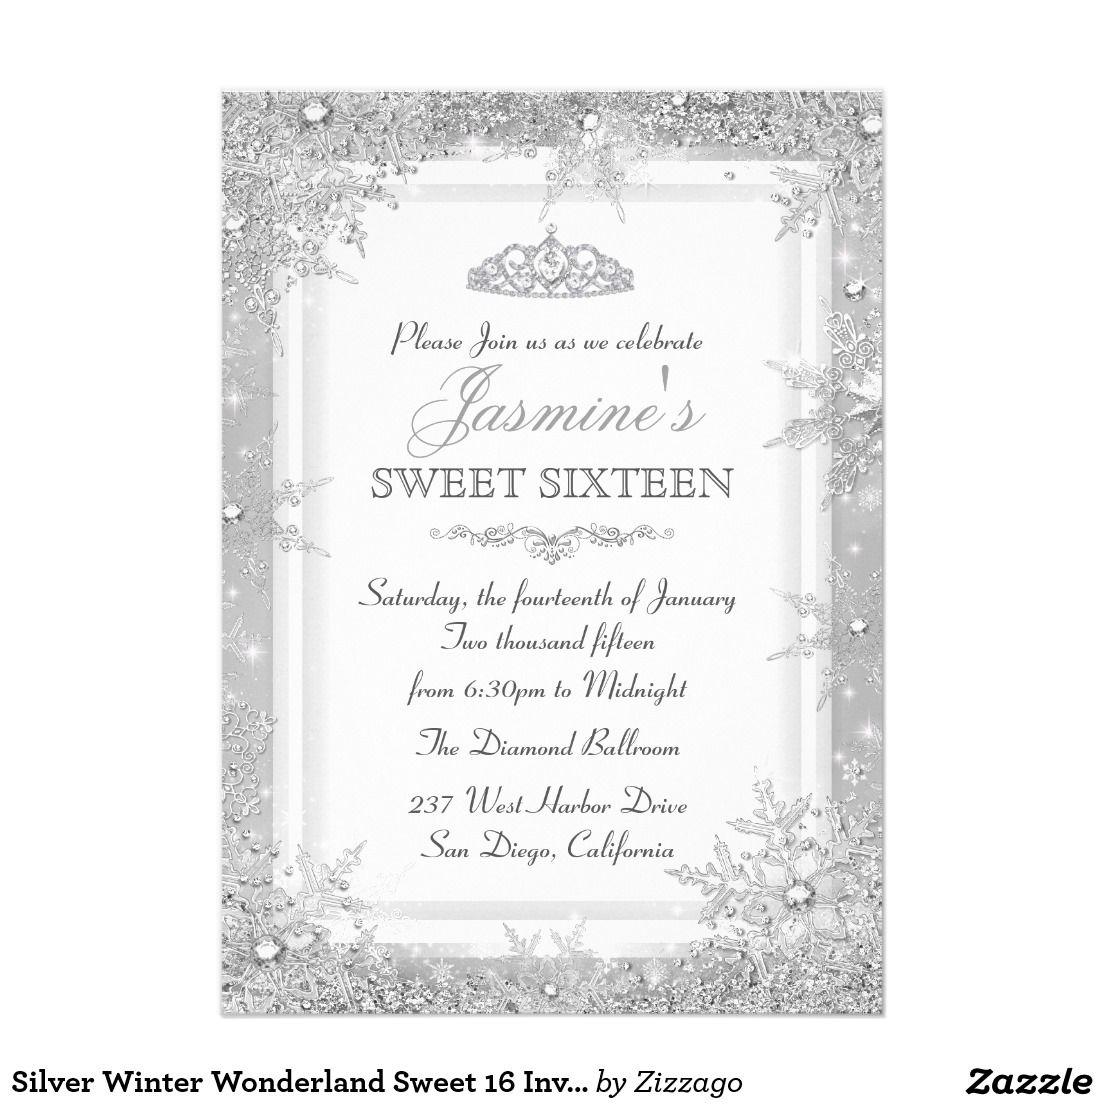 Silver Winter Wonderland Sweet 16 Invitation | 50th Ideas ...